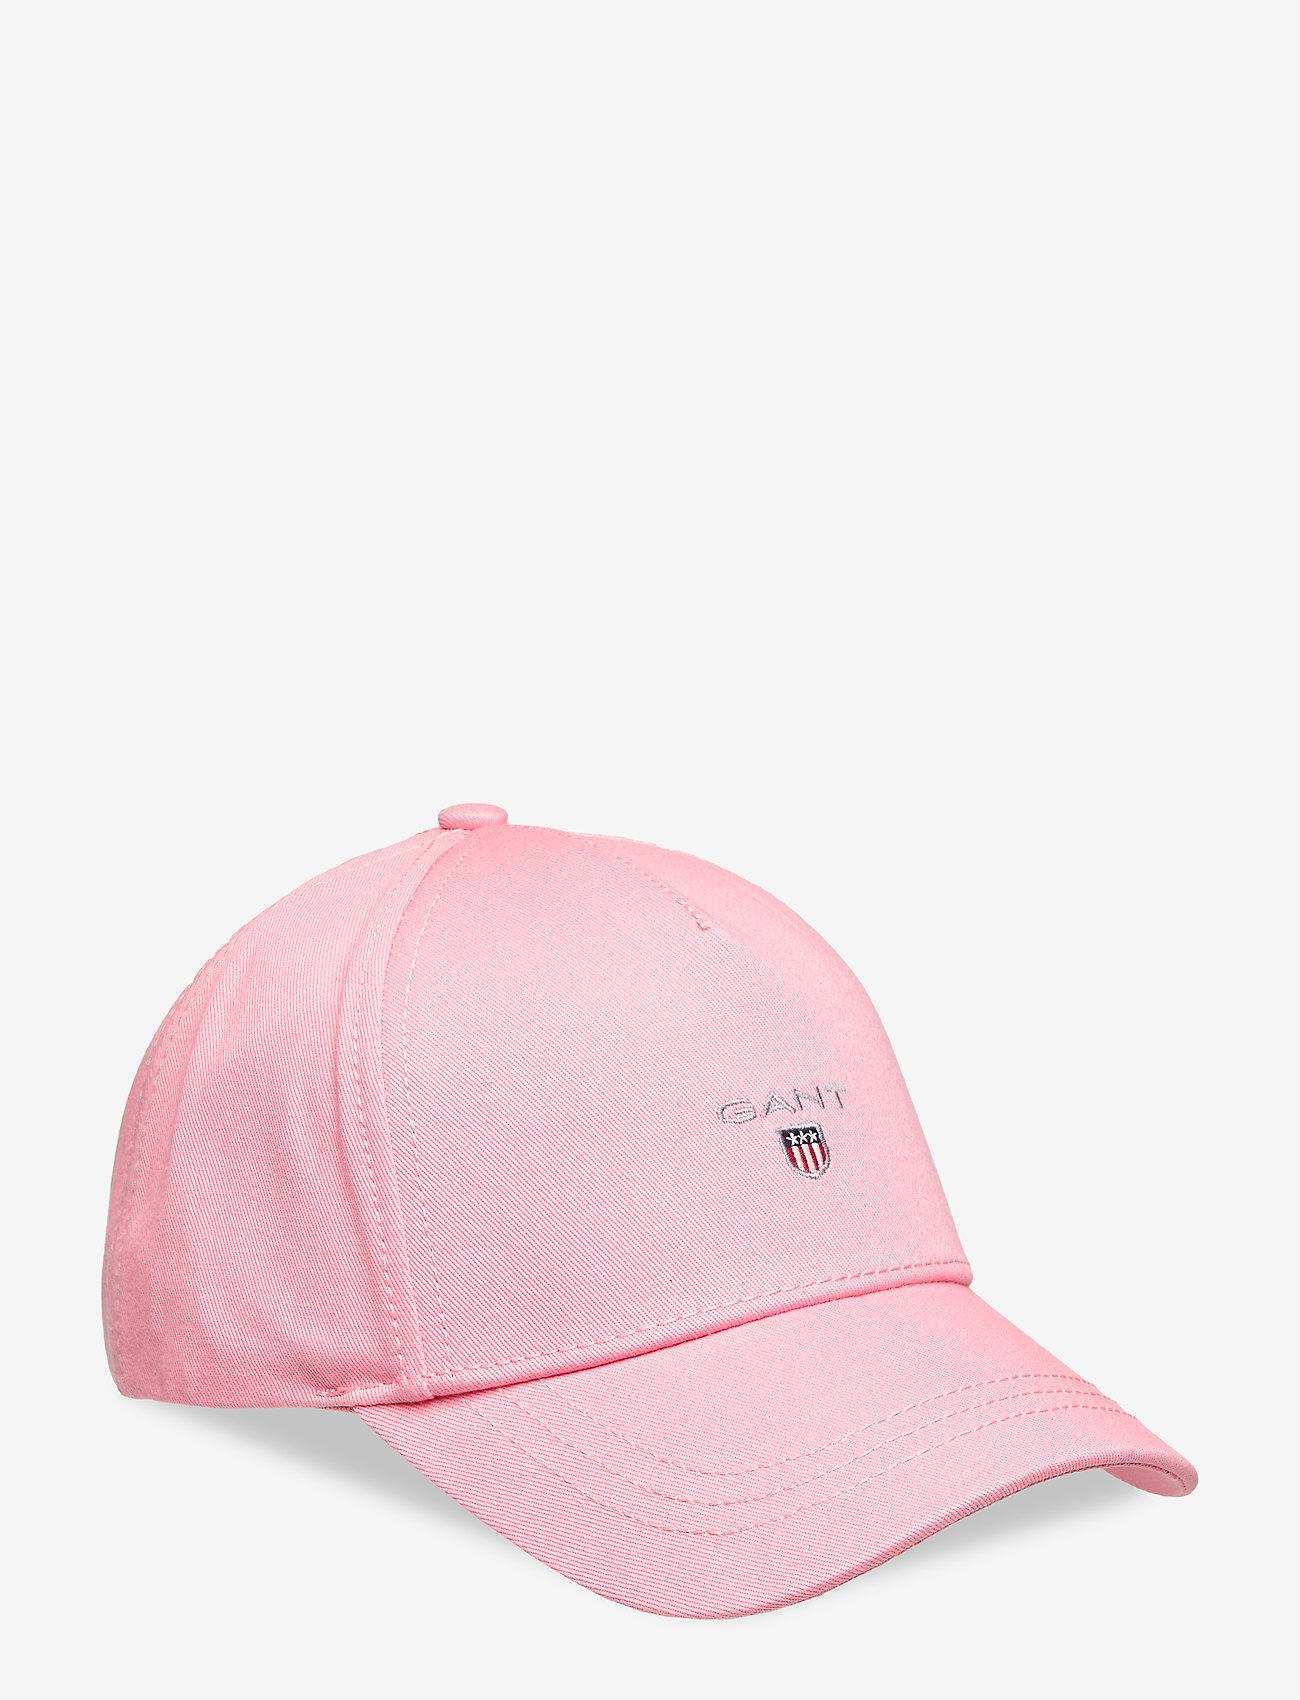 GANT - ORIGINAL SHIELD CAP - caps - strawberry pink - 0